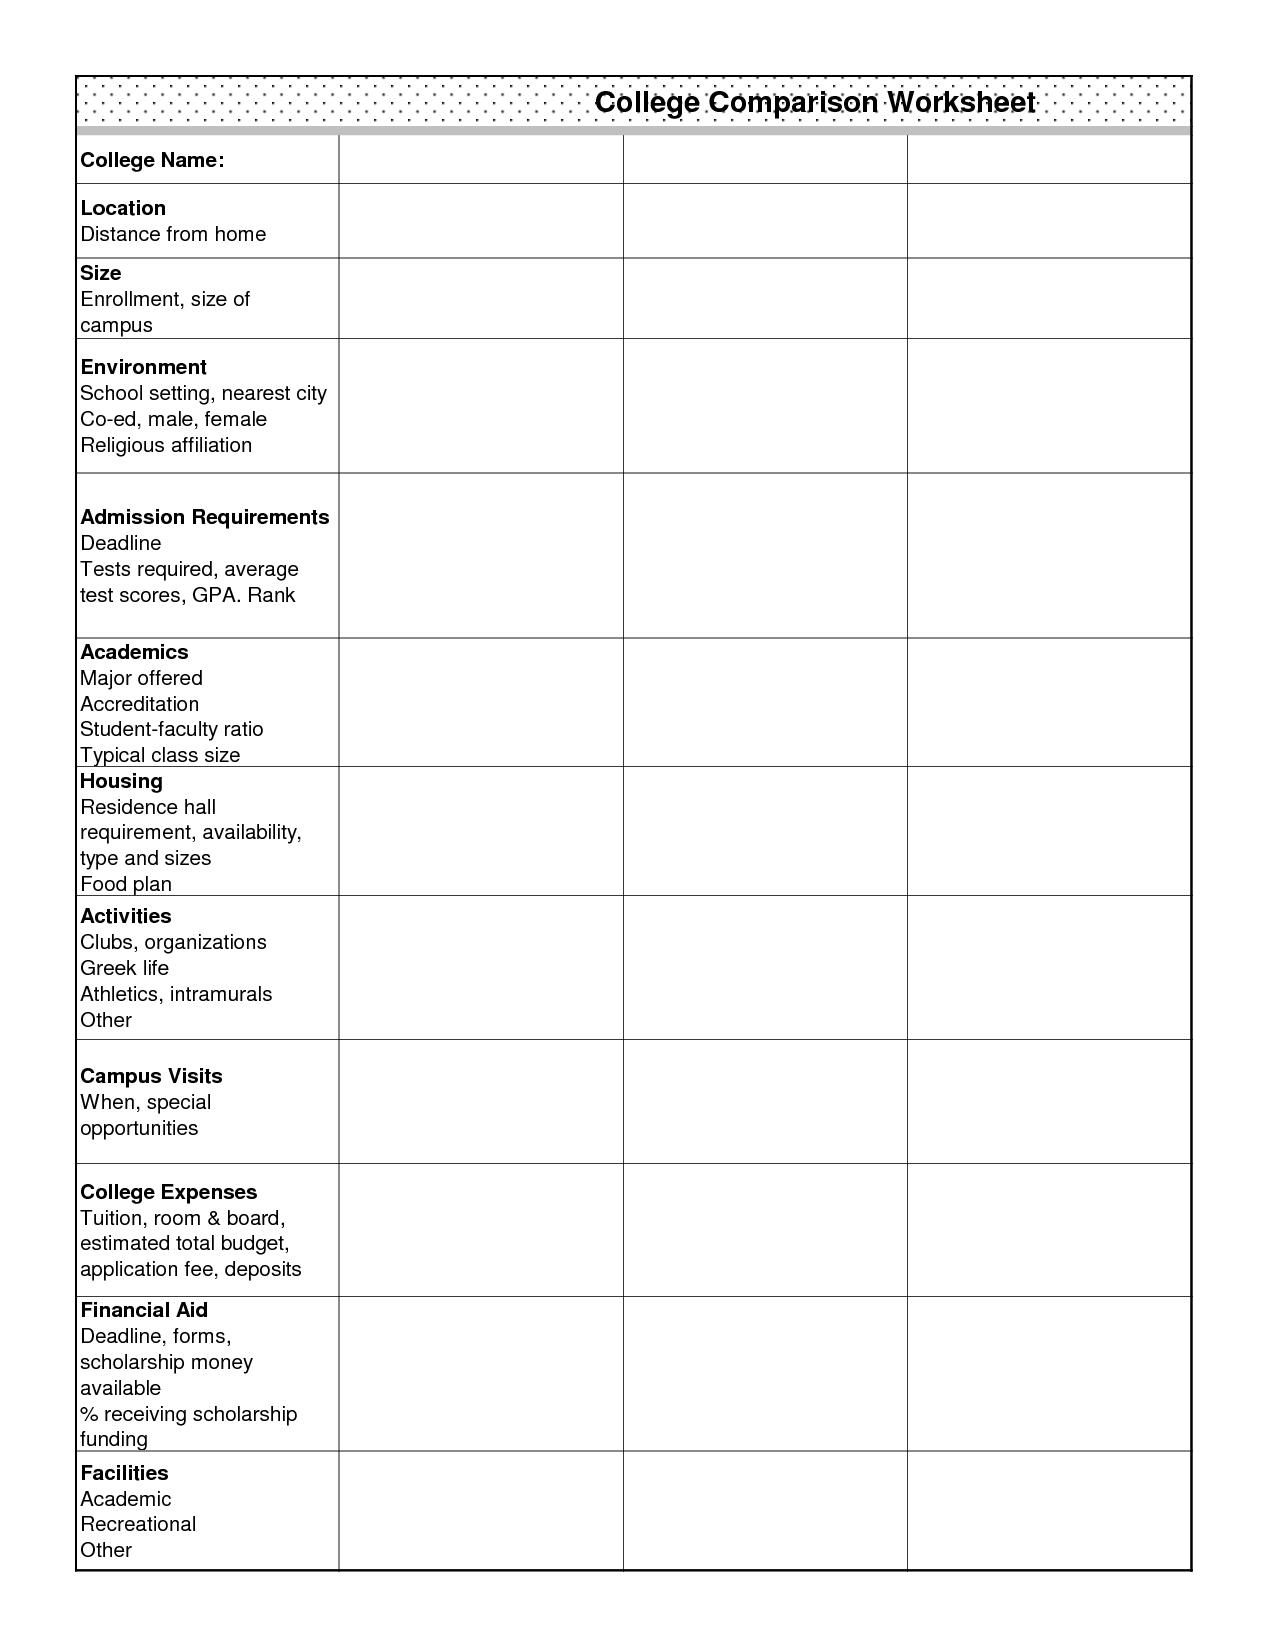 Medical School Comparison Chart